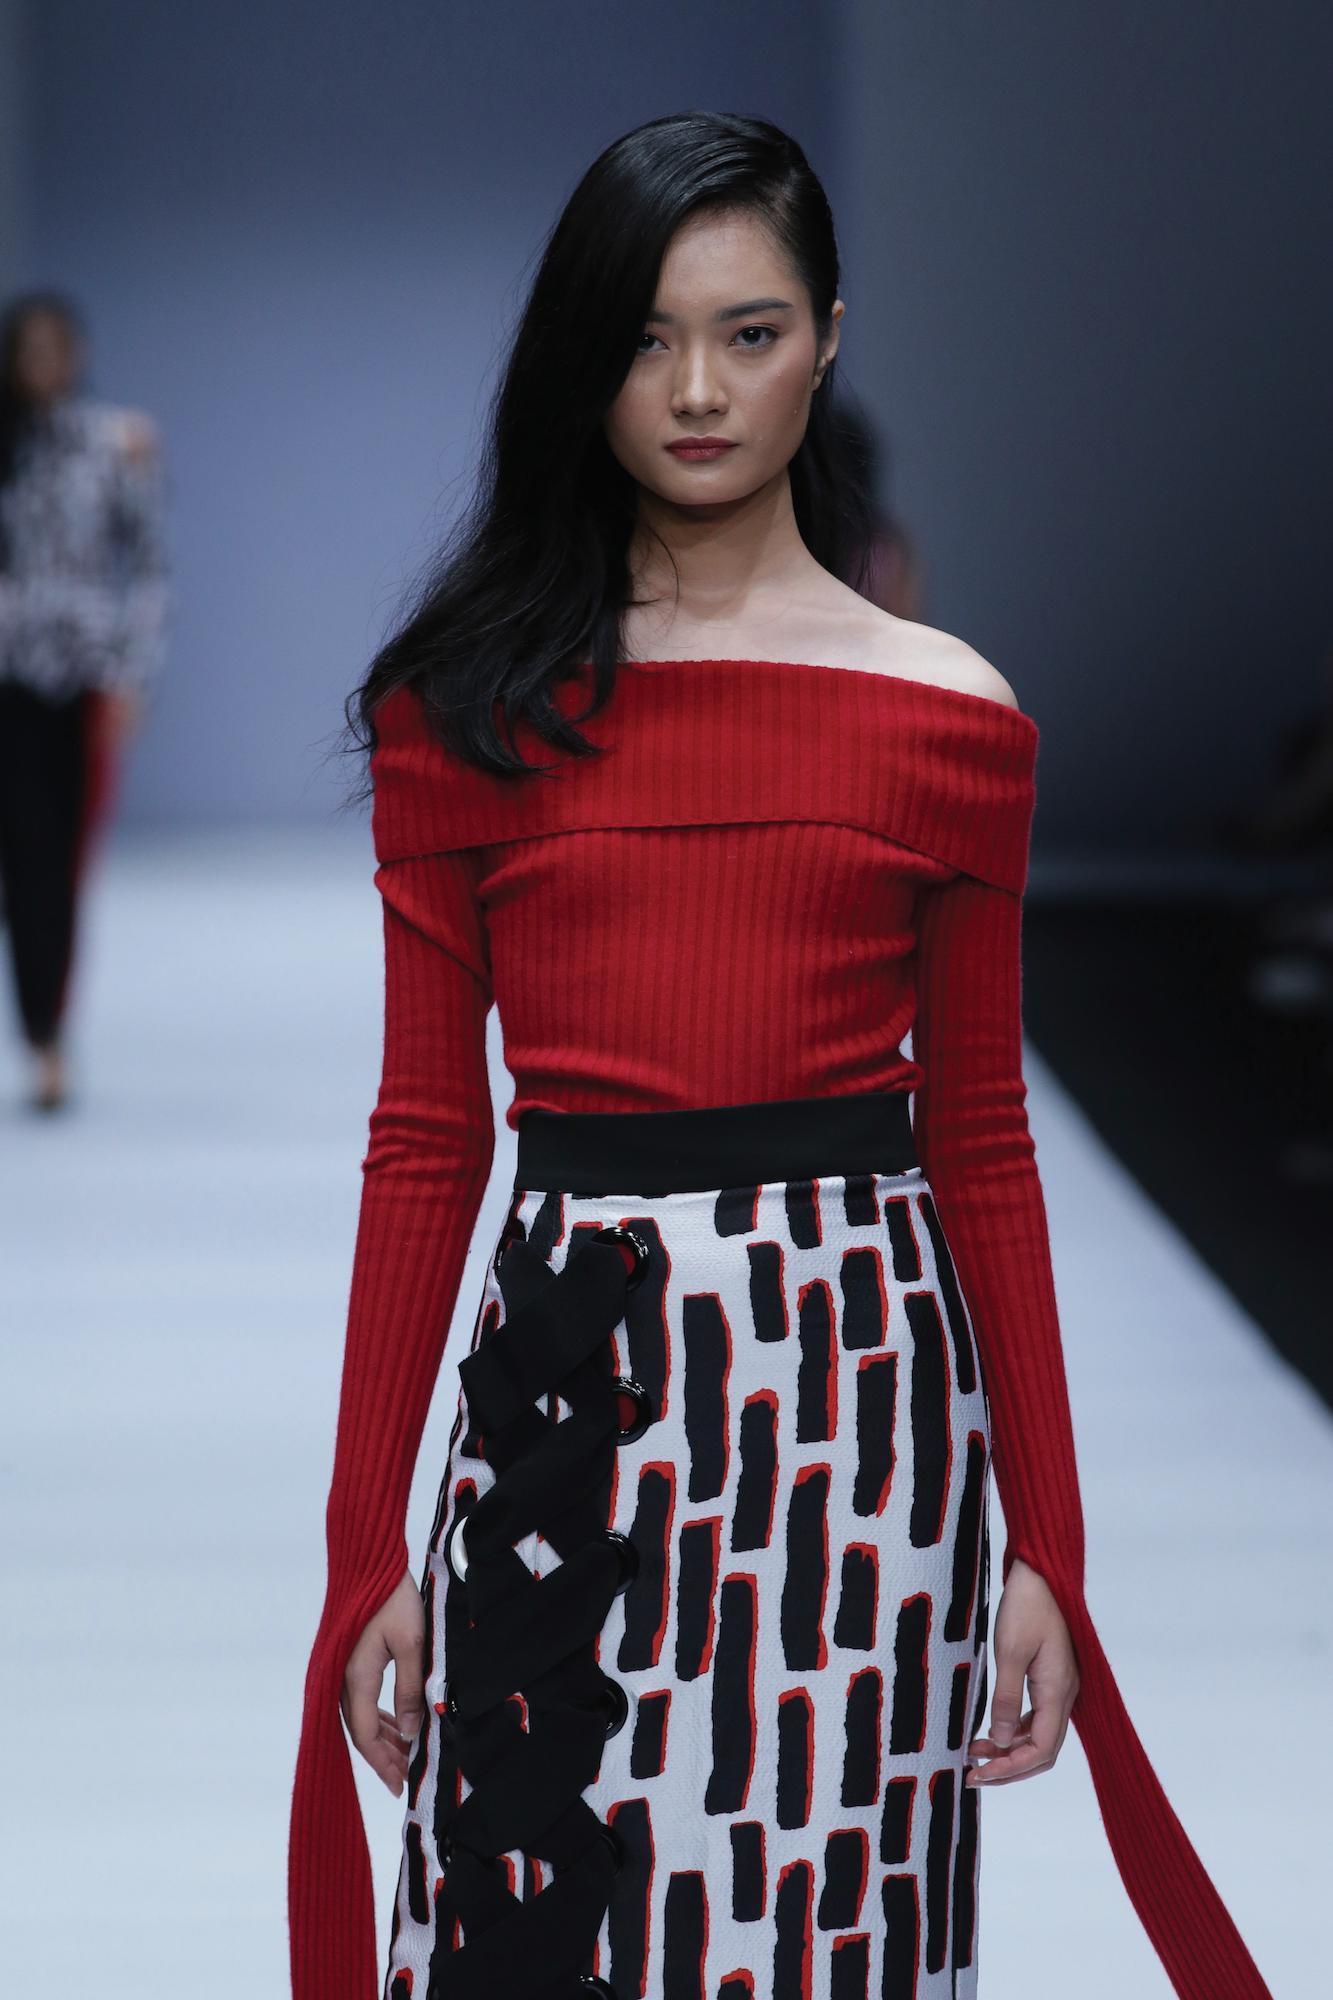 Wanita asia dengan model rambut wet look pada rambut lurus hitam panjang. Jakarta Fashion Week 2019